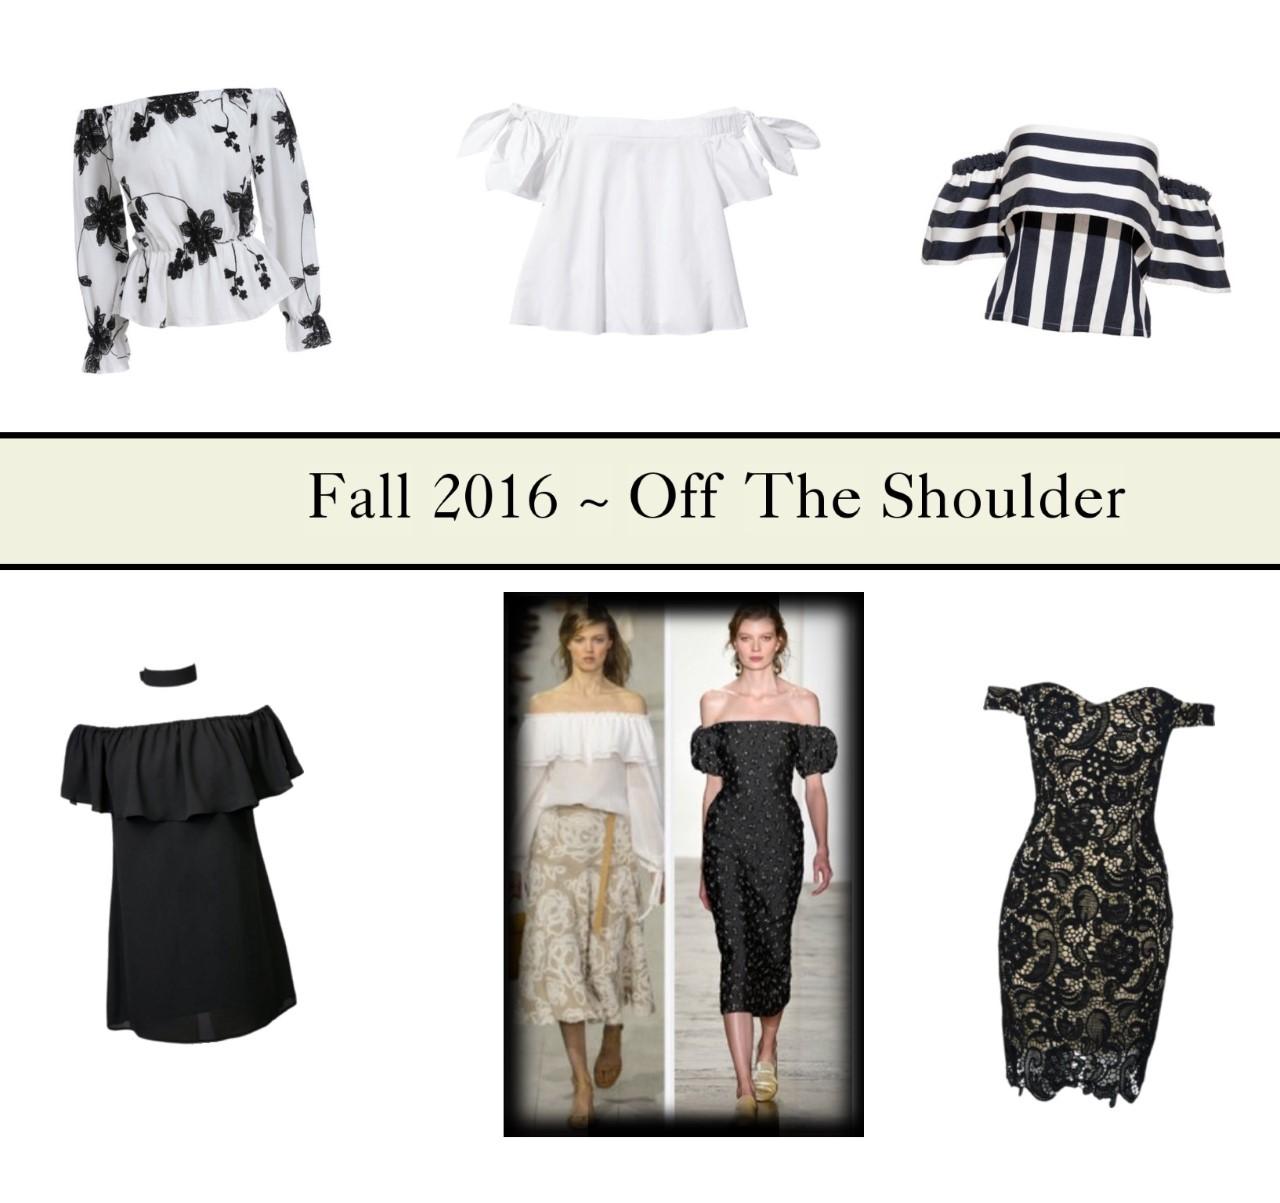 off the shoulder fashion